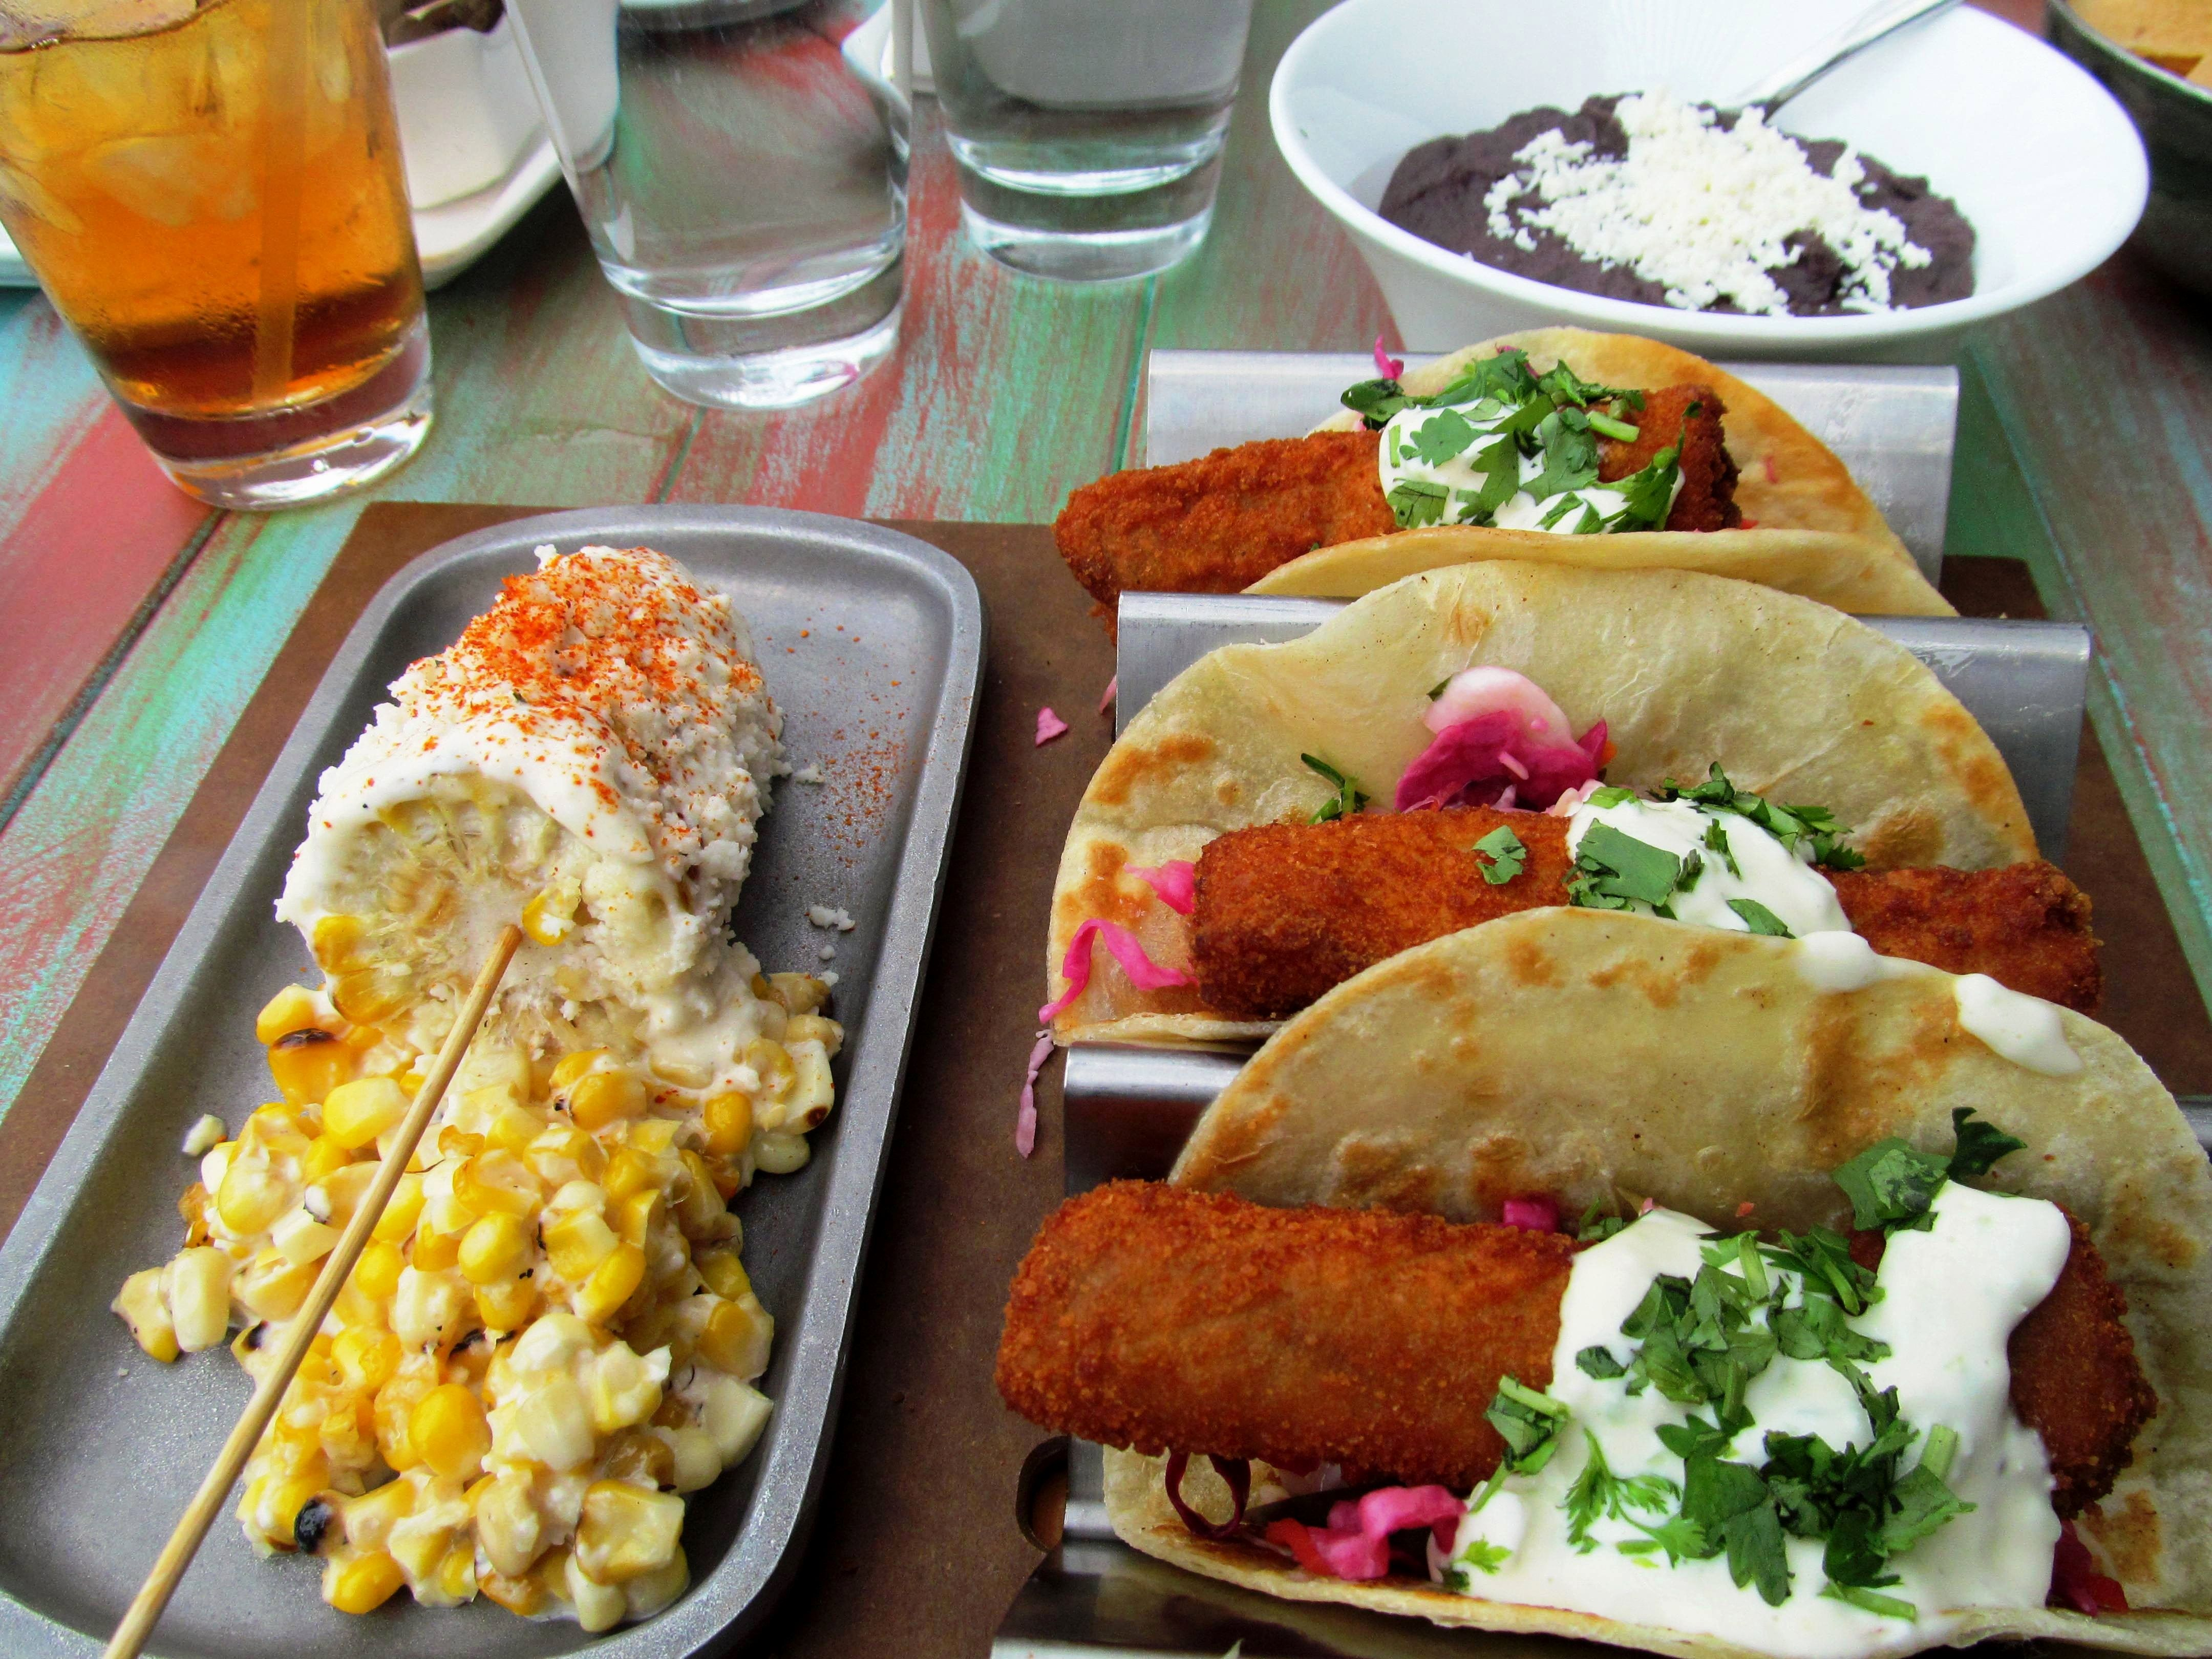 Israel Food Near Me 1473 Israelfood Foodisrael Food Israel Food Informatiounen Op Eisem Site ಇಸ ರ ಲ I Food Fast Healthy Meals Mexican Food Recipes